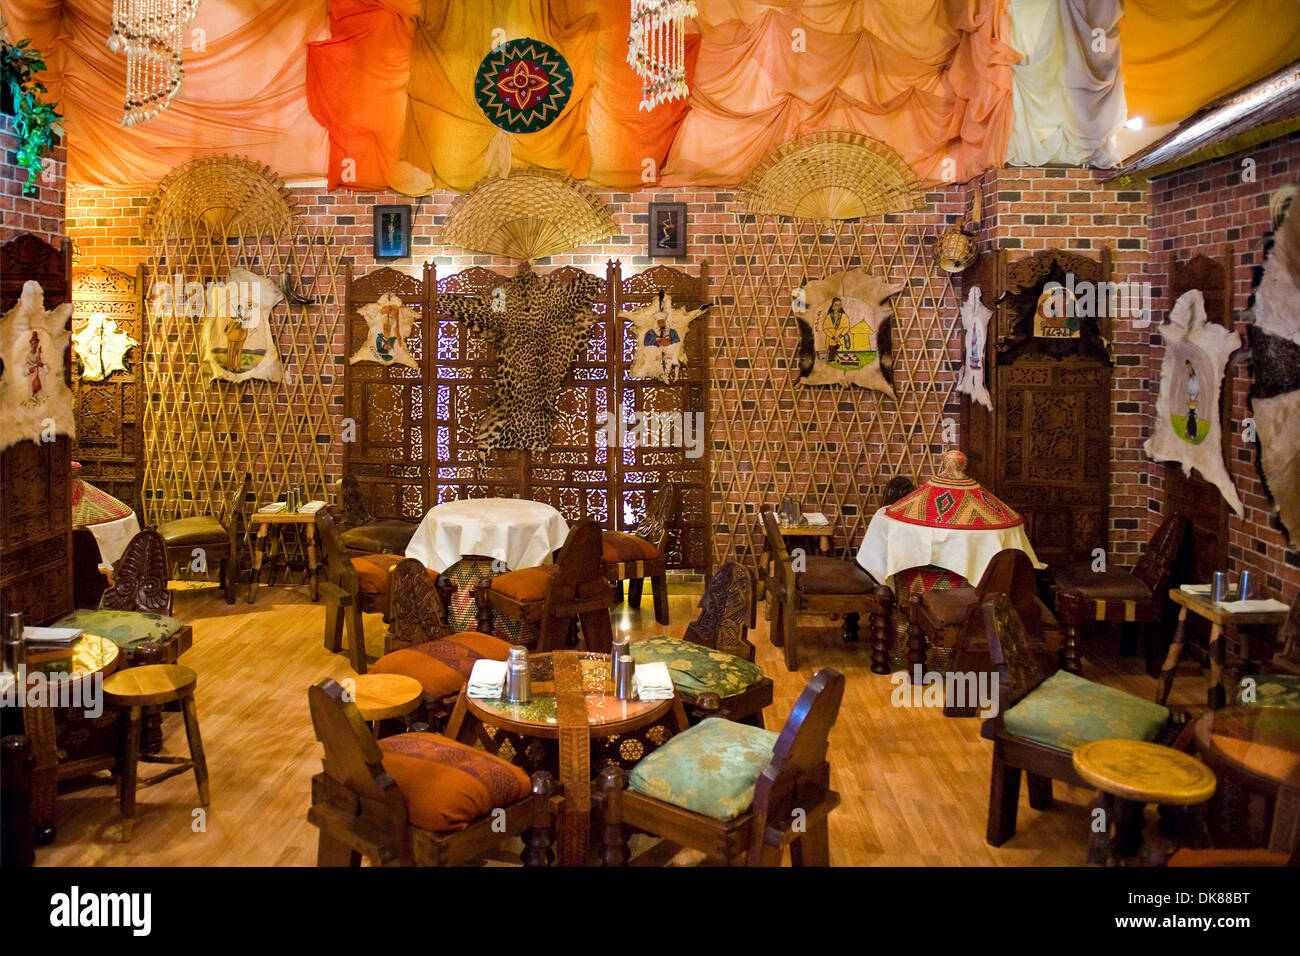 Cucina Etnica Milanese Africana Immagini & Cucina Etnica Milanese ...